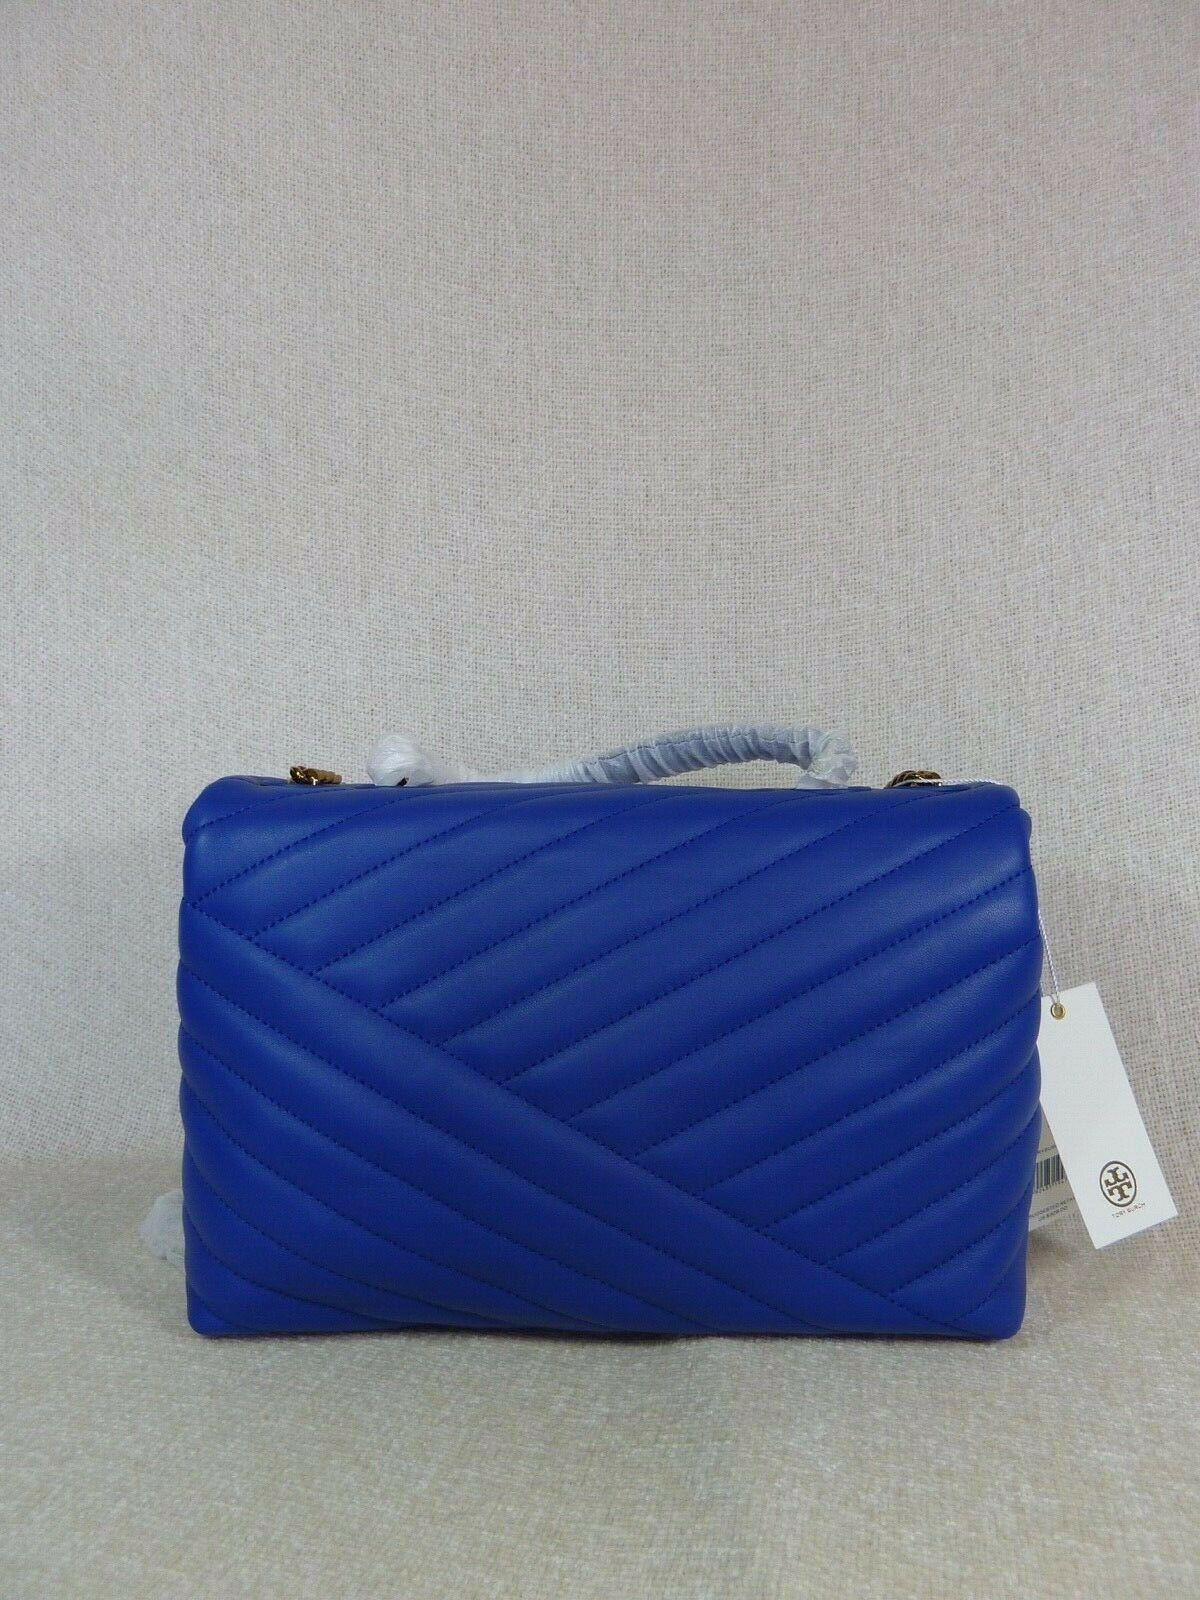 NWT Tory Burch Nautical Blue Kira Chevron Convertible Shoulder Bag image 6